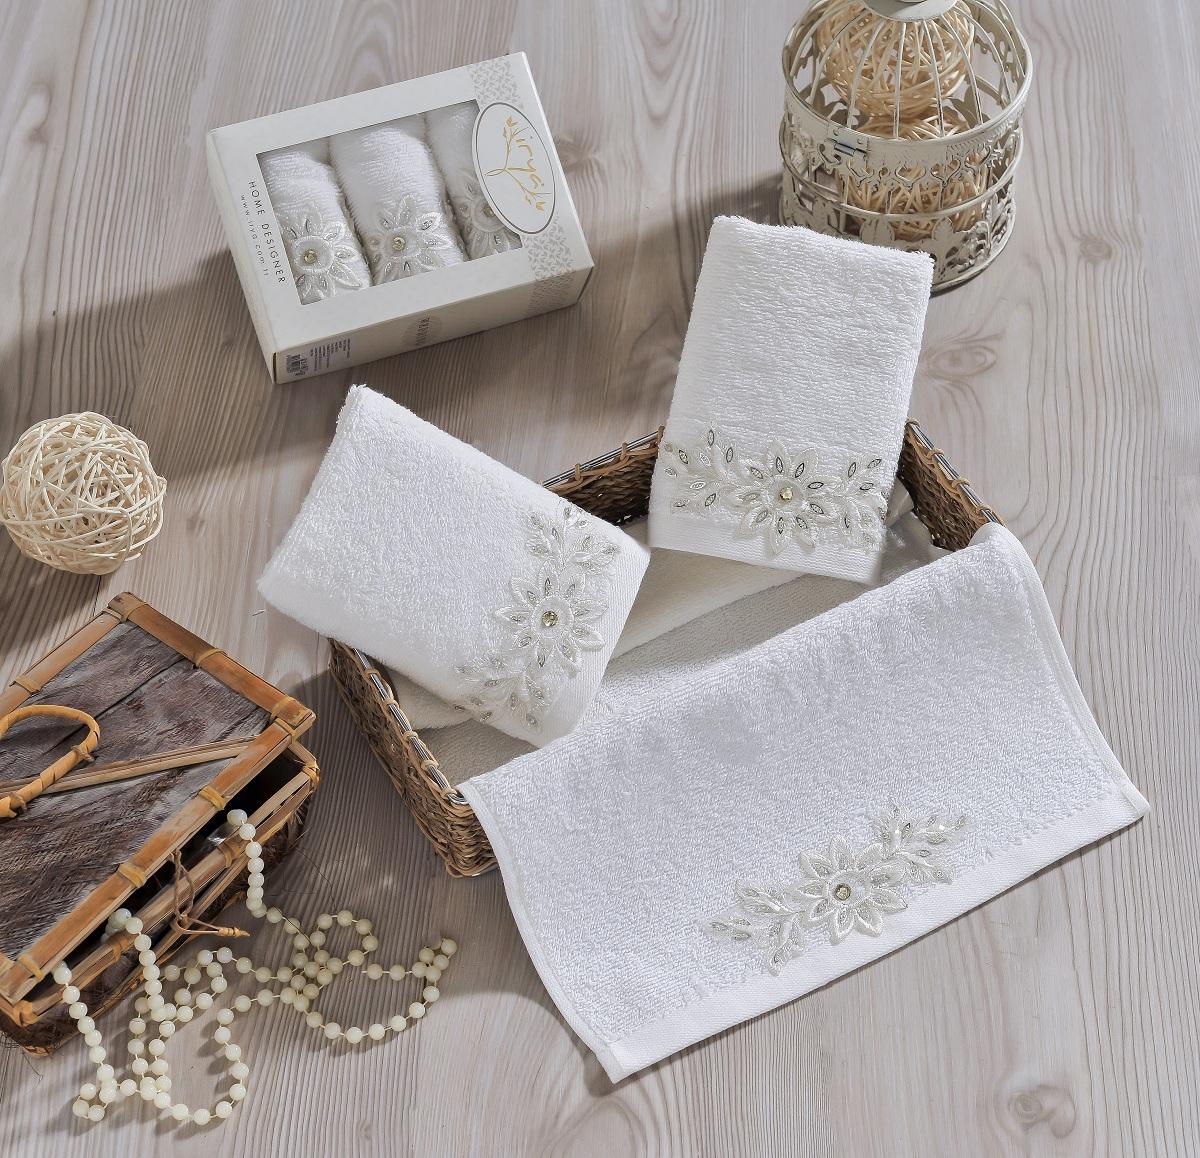 Купить Полотенца IRYA, Полотенце Cool Цвет: Молочный (30х50 см - 3 шт), Турция, Бежевый, Махра